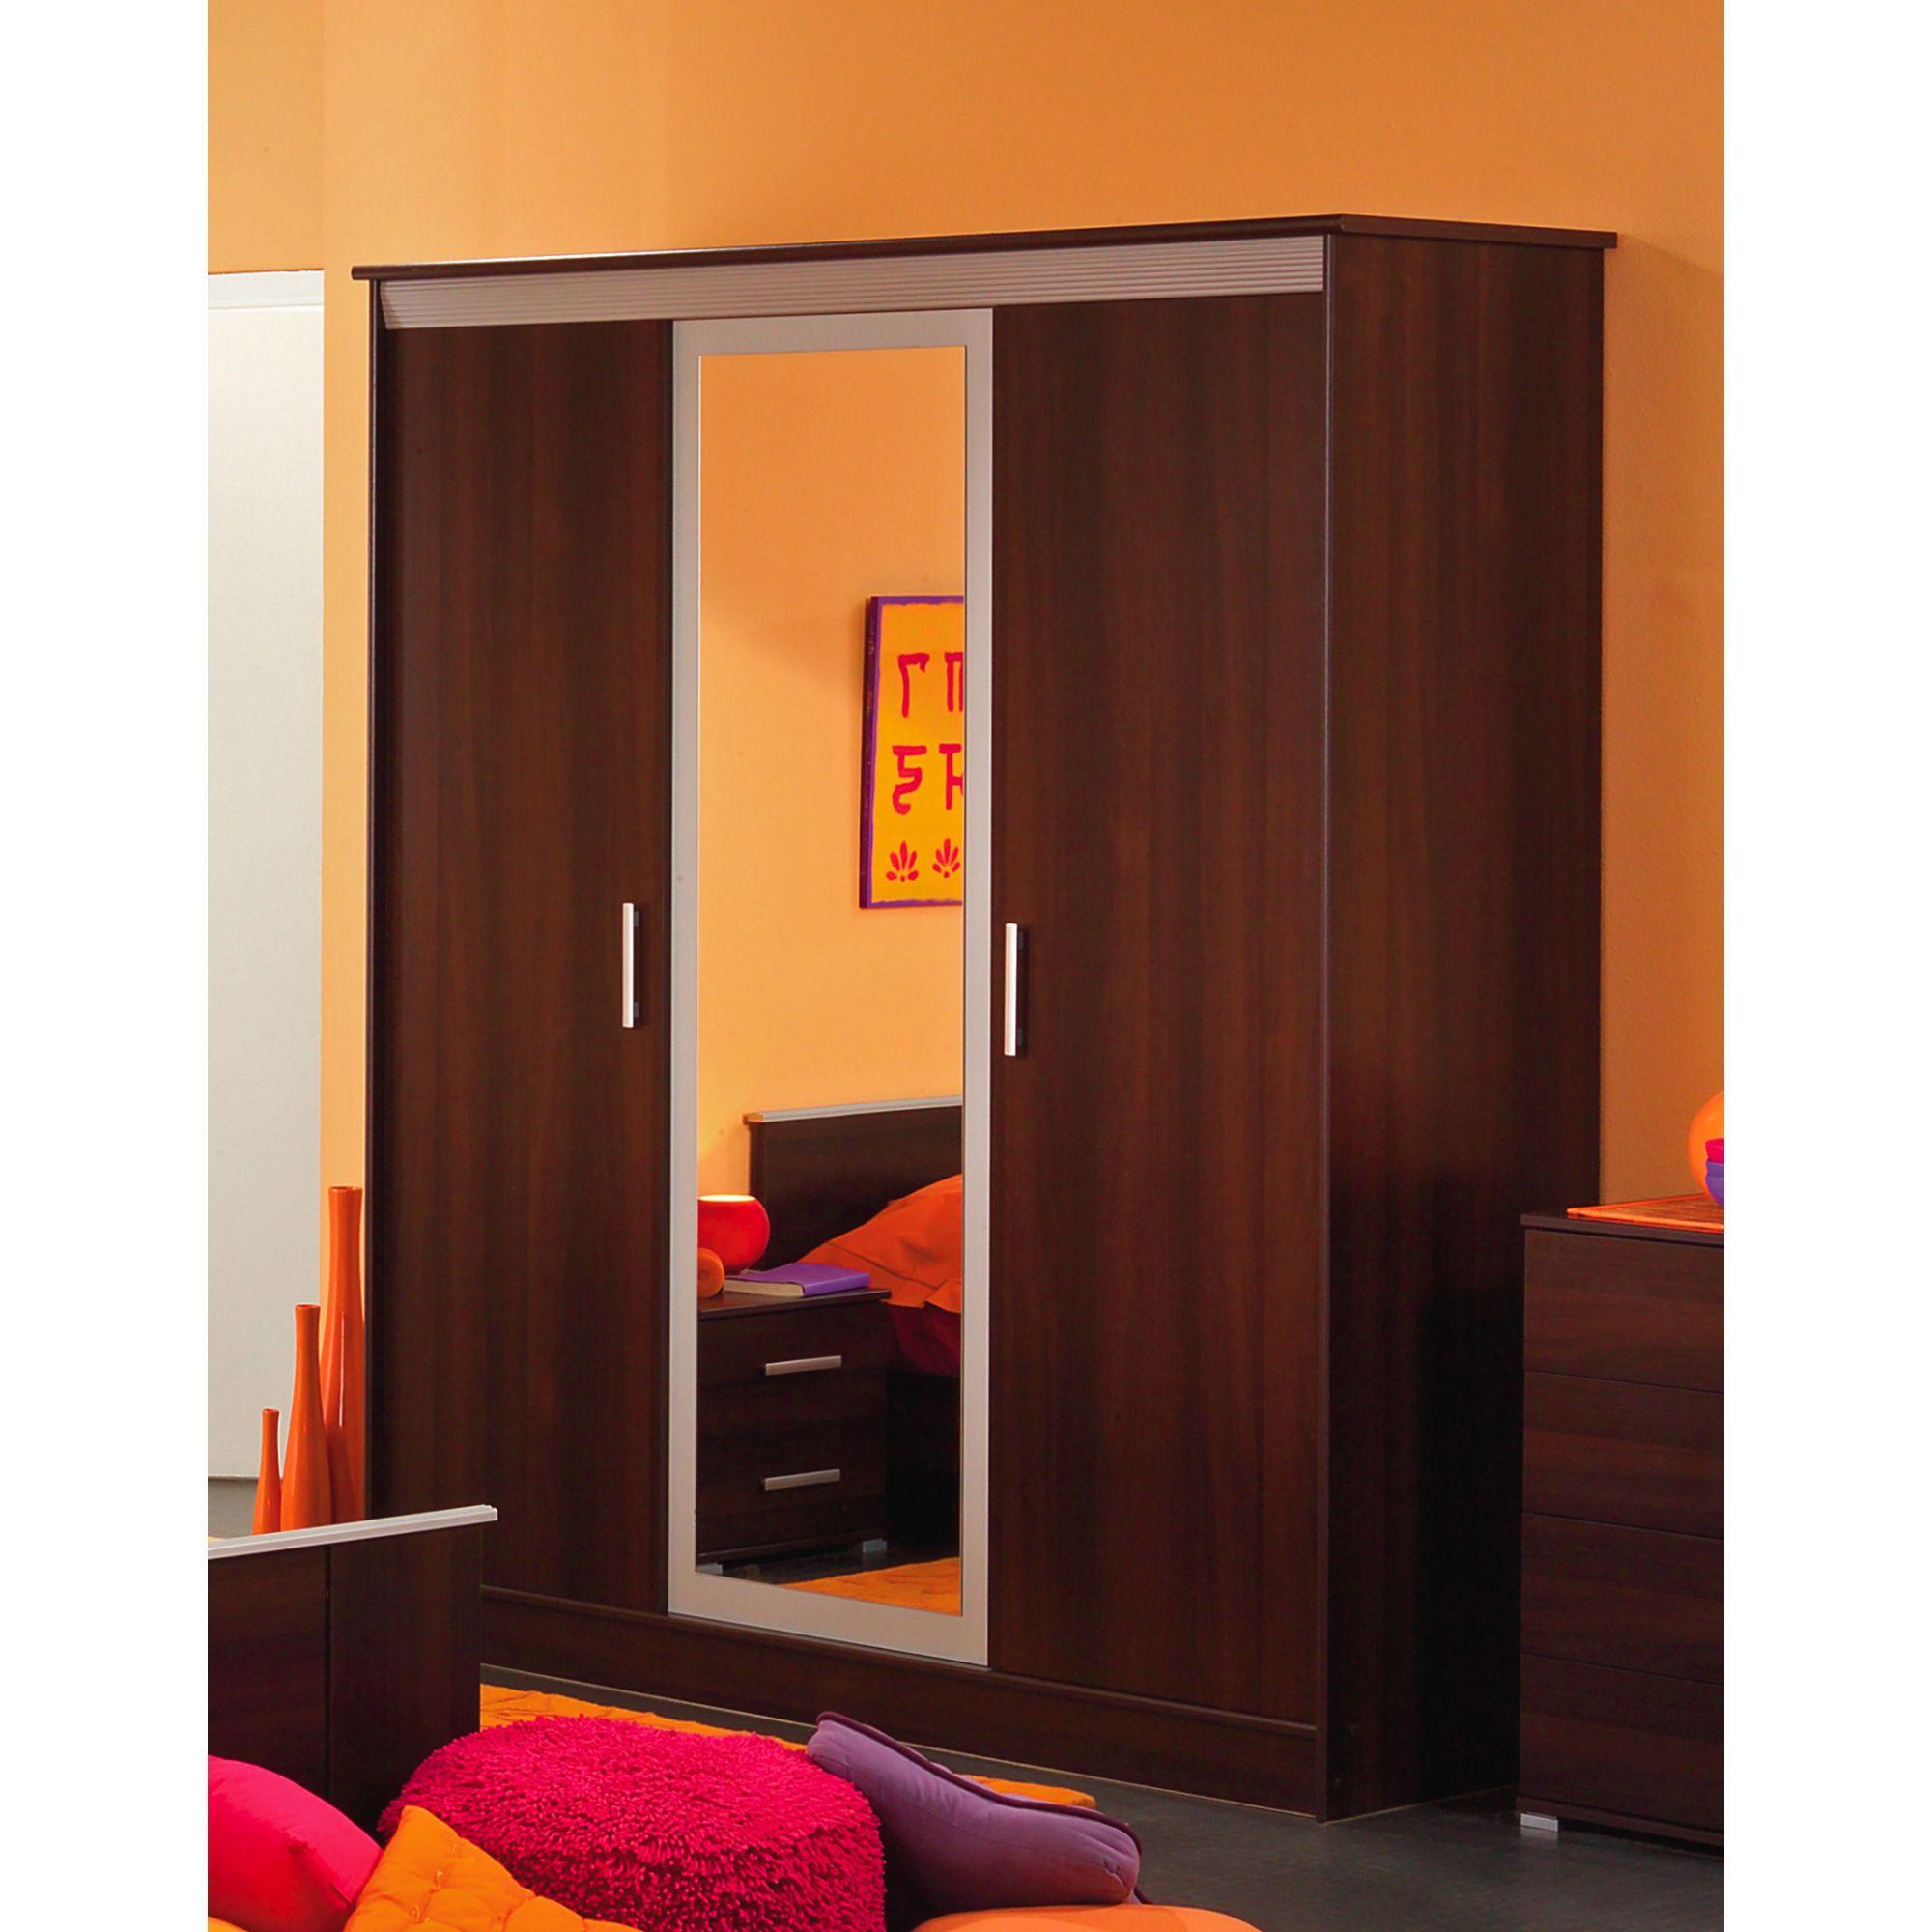 Parisot Samba Three Door Wardrobe in Dark Walnut / Metal Grey at Tesco Direct